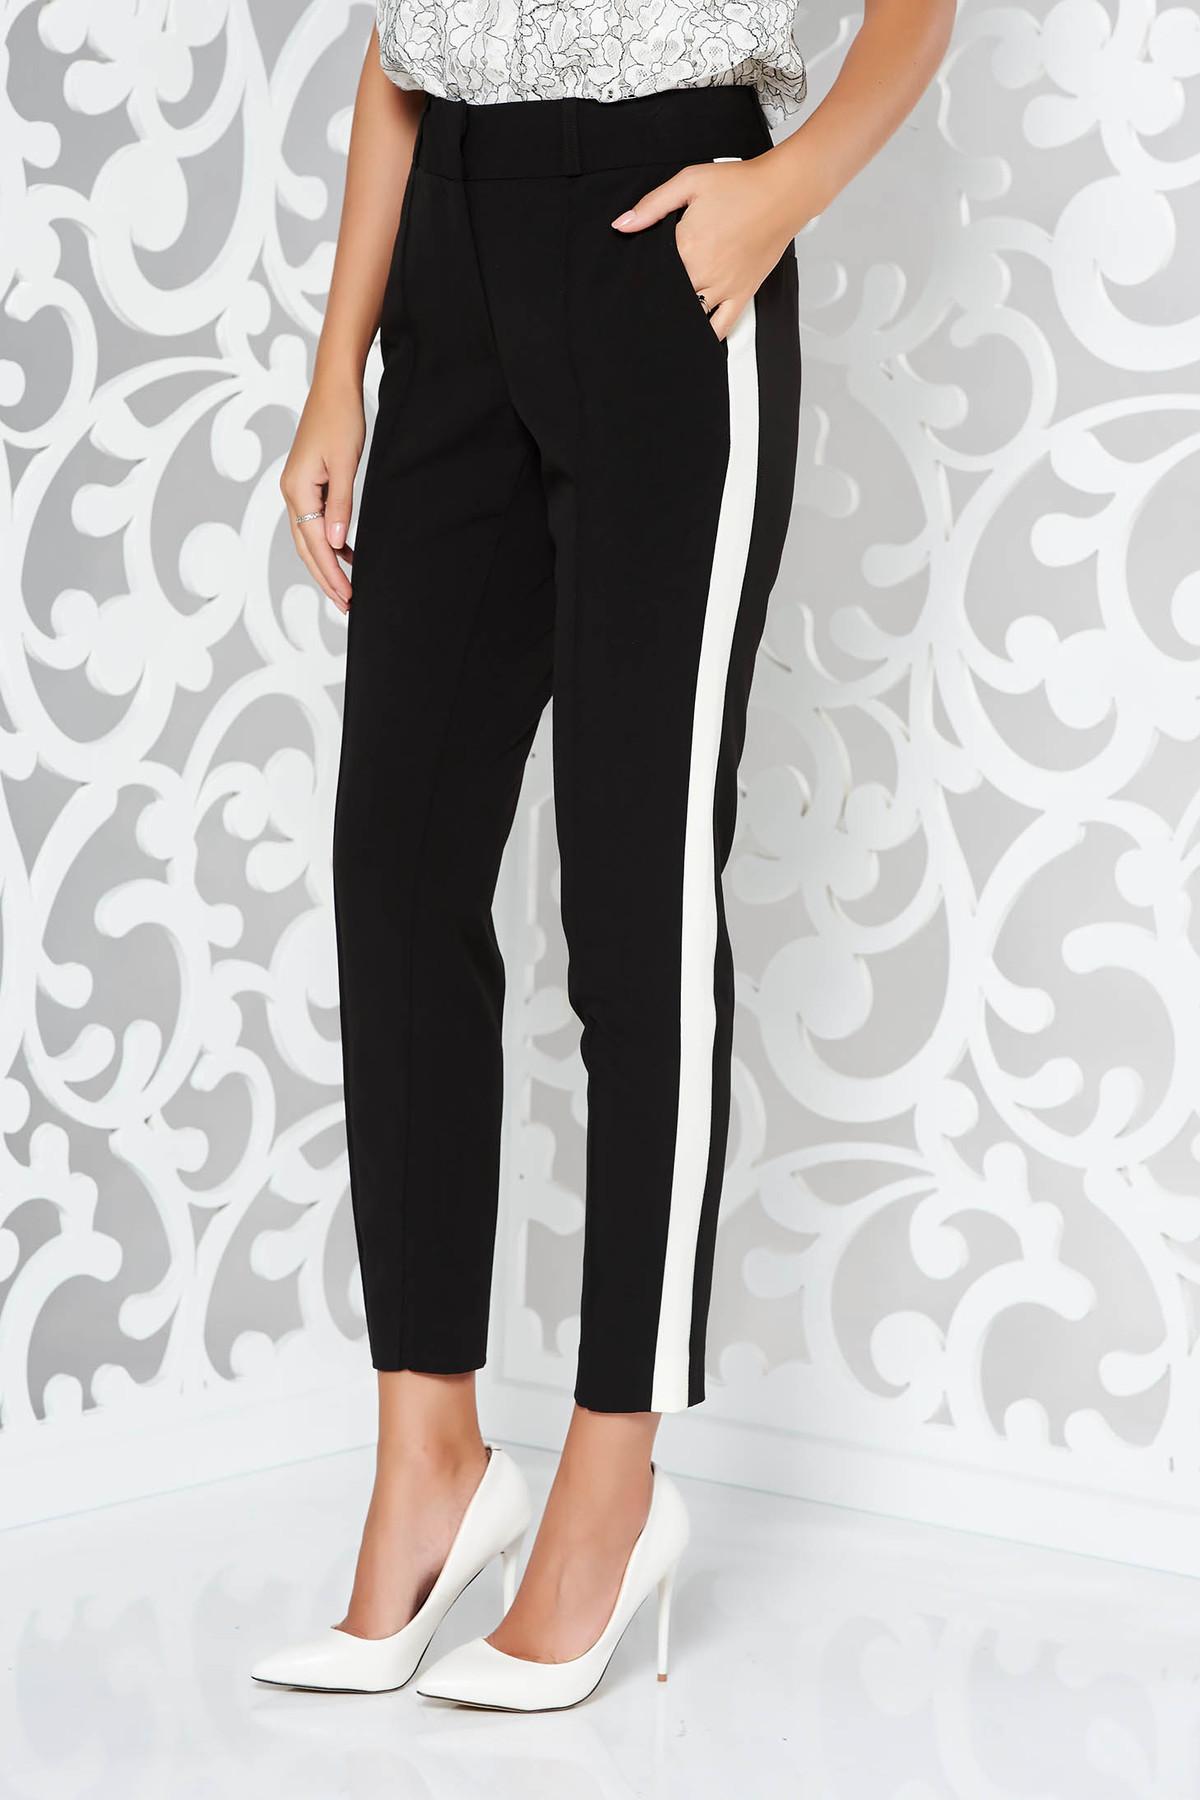 Pantaloni StarShinerS negri office cu un croi mulat din stofa subtire usor elastica cu buzunare